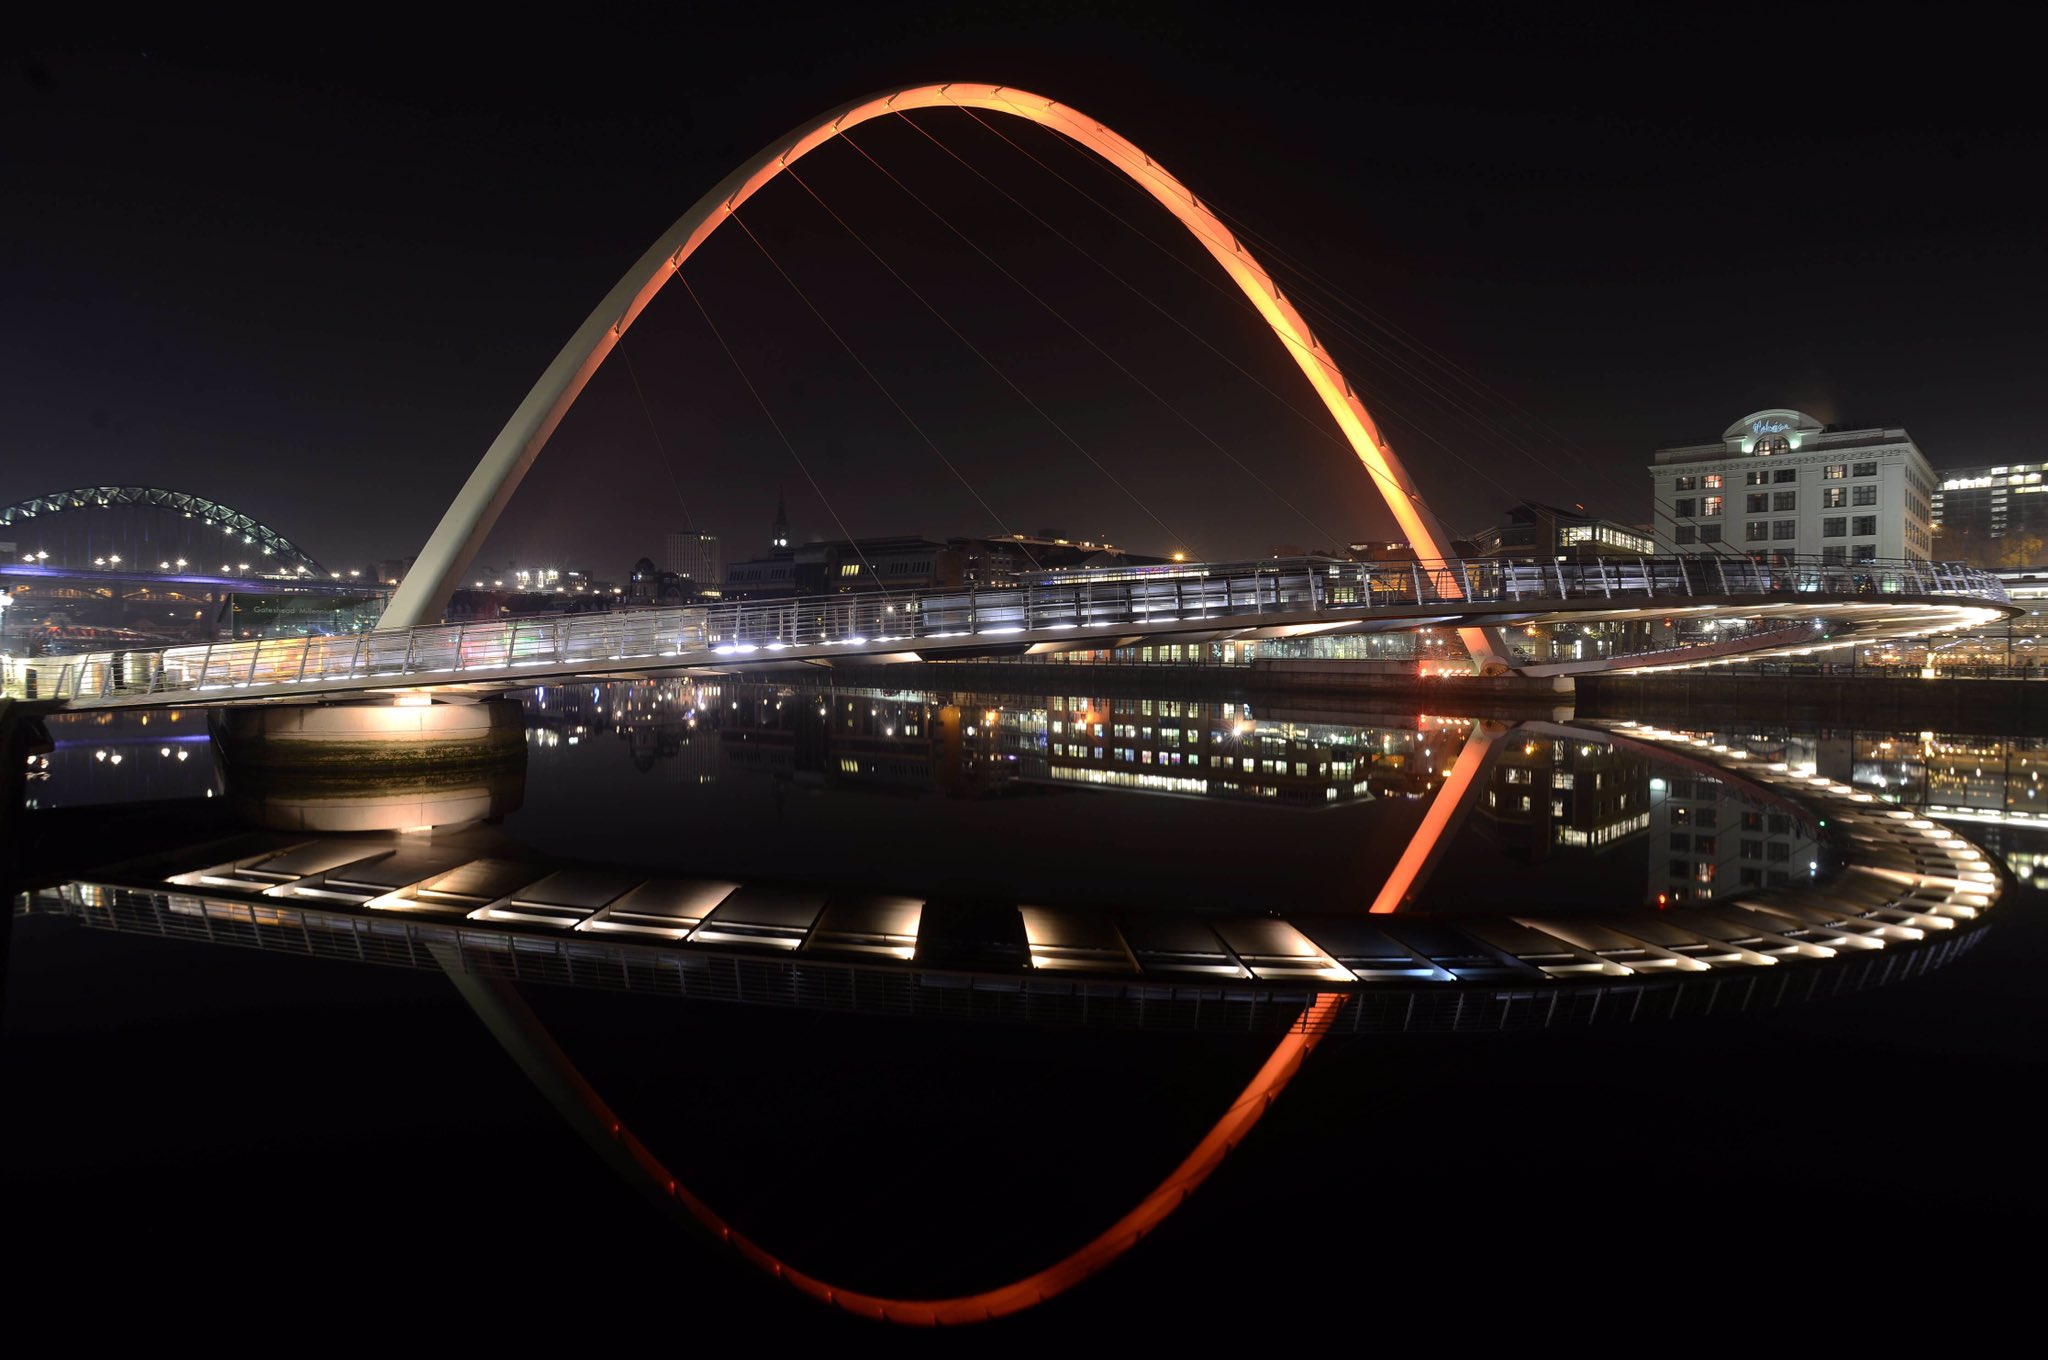 Last night the @RCObsGyn turned Gateshead Millennium Bridge orange for #16Days #orangetheworld. Tweet us your pictures! @SayNO_UNiTE https://t.co/QJnKz2TisF